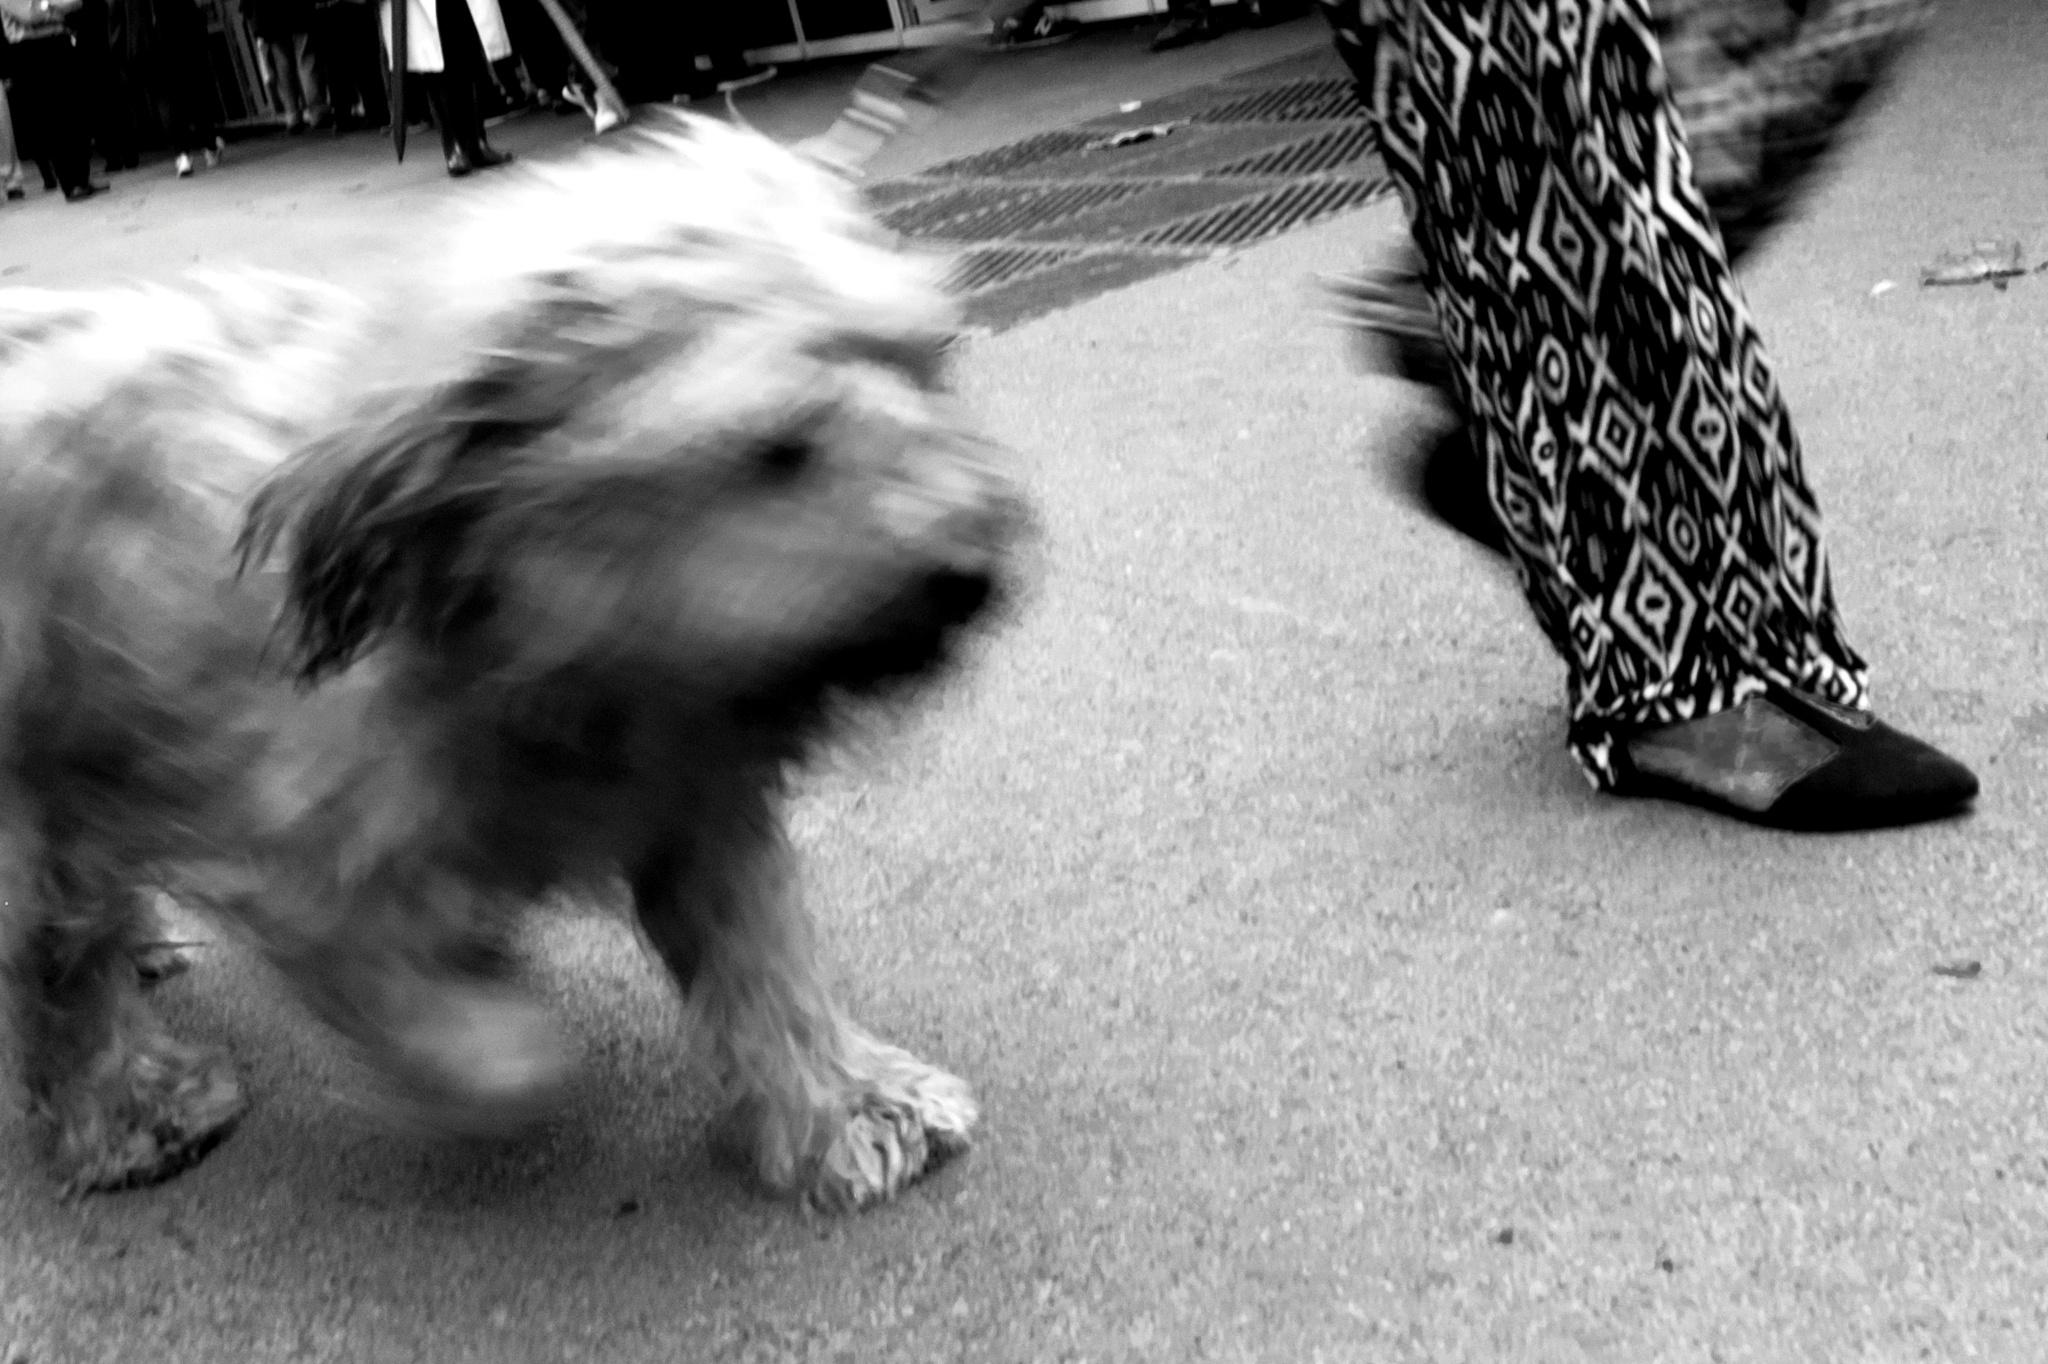 Running the dog (2) by juliandelnogal